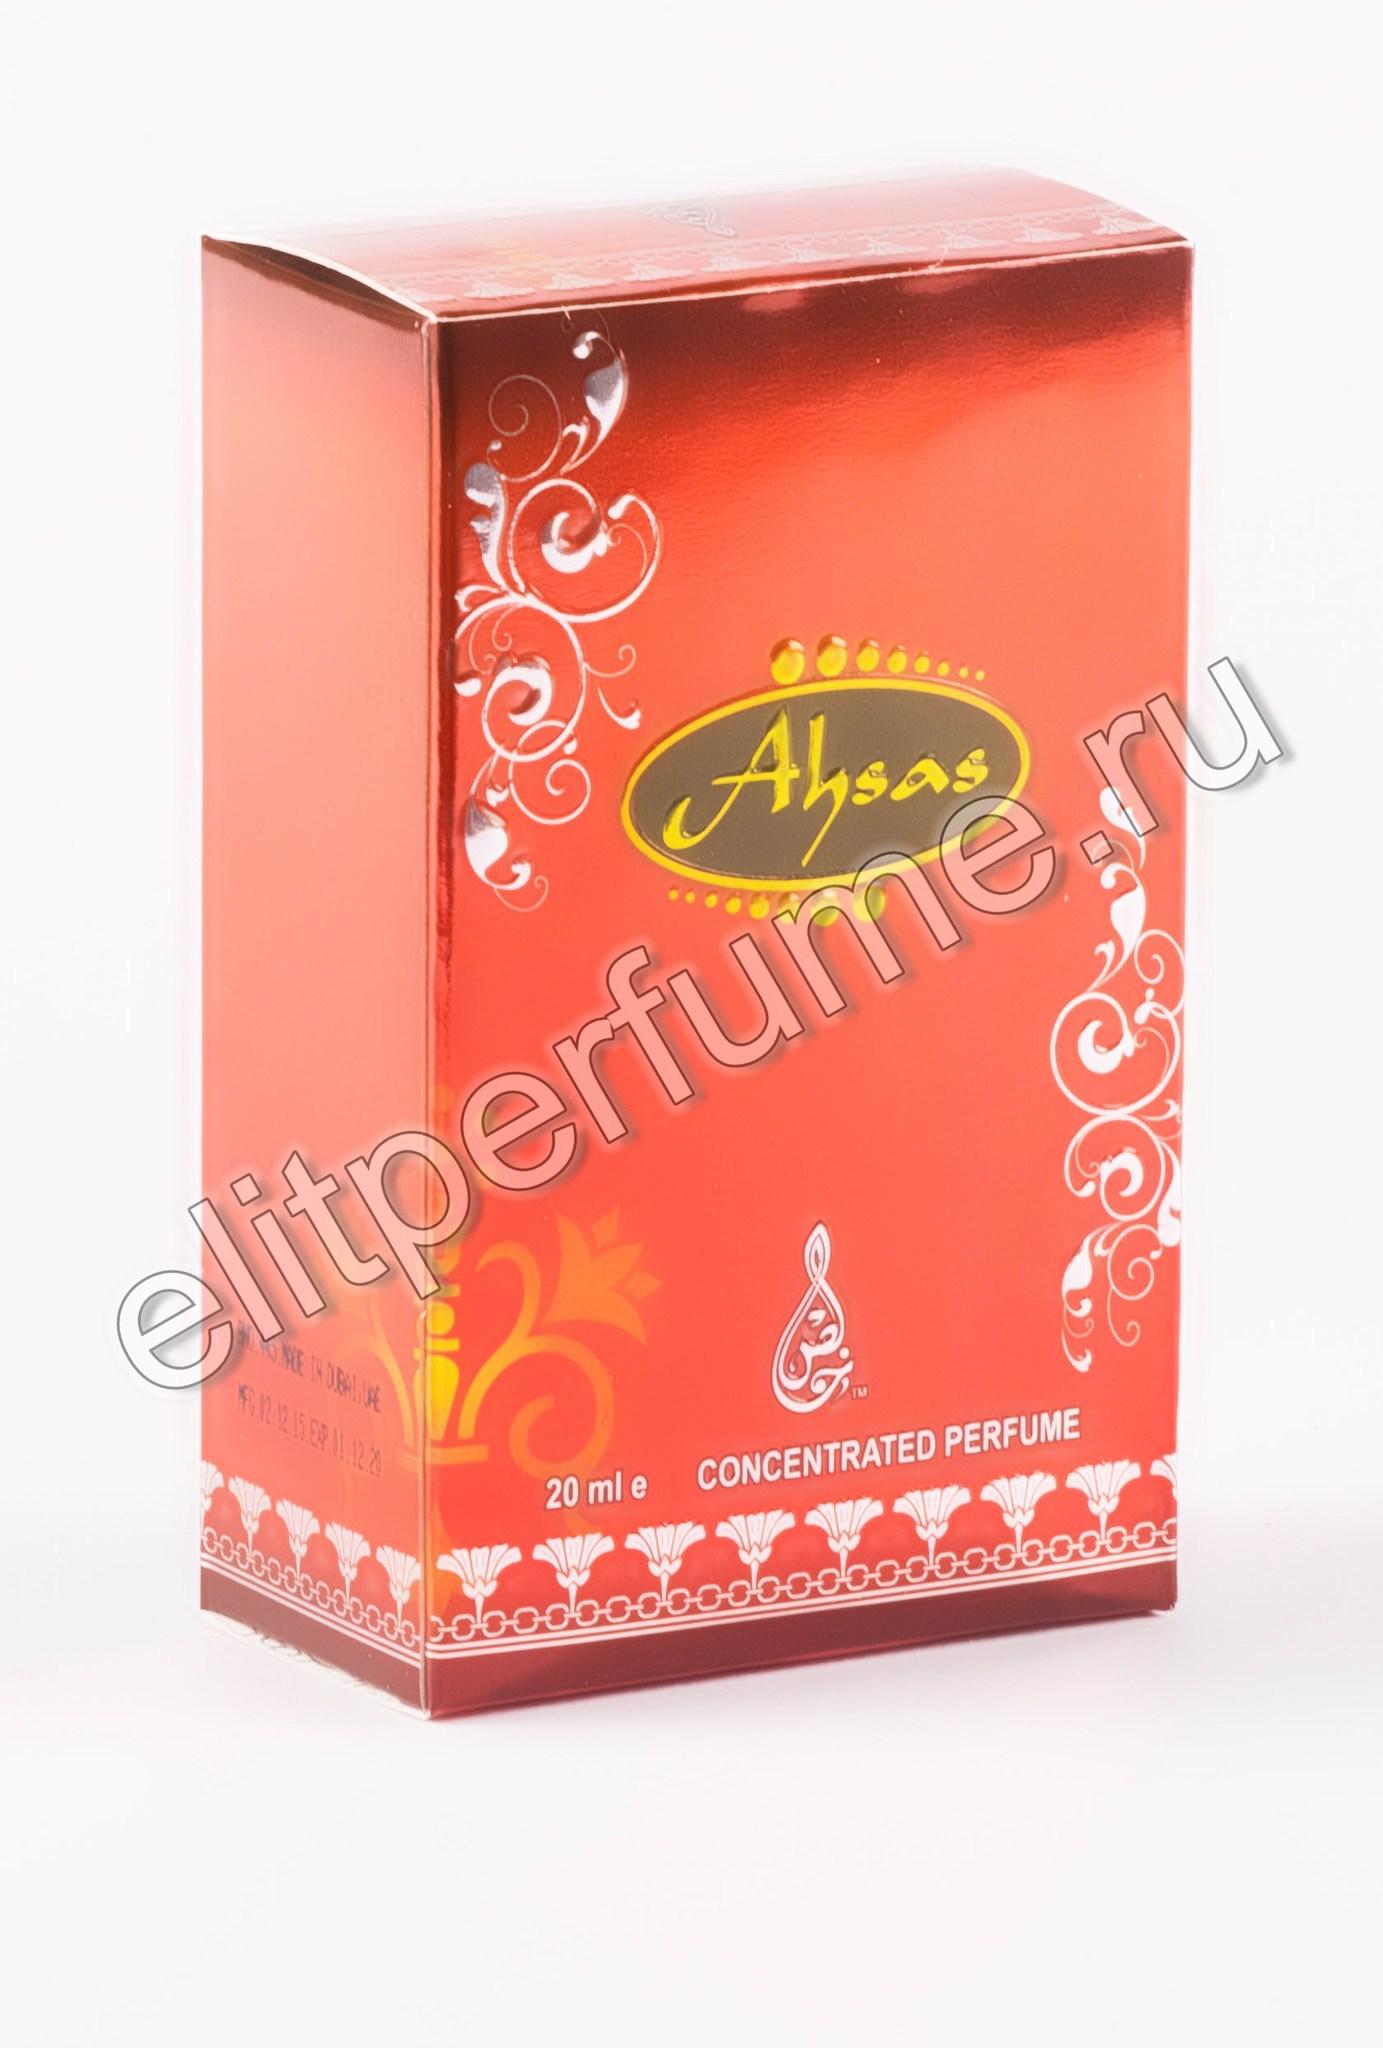 Ahsas Ахсас 20 мл арабские масляные духи от Халис Khalis Perfumes